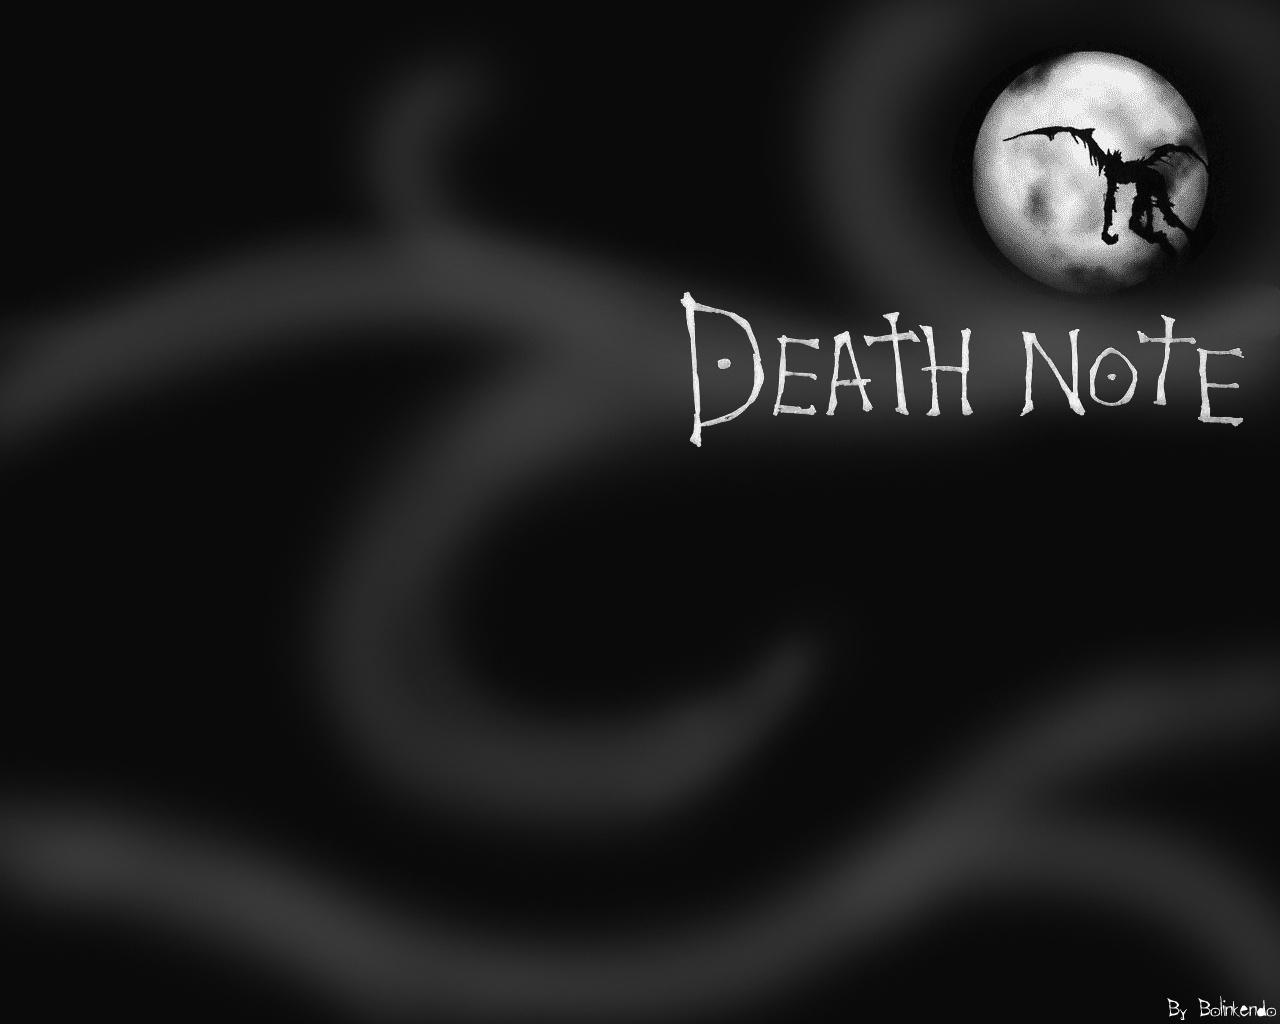 http://2.bp.blogspot.com/_q9hmXw3O2iY/TIFfYIUugQI/AAAAAAAACrA/jQ_BJAdCIT8/s1600/death_note_wallpaper_4-1280x1024.jpg